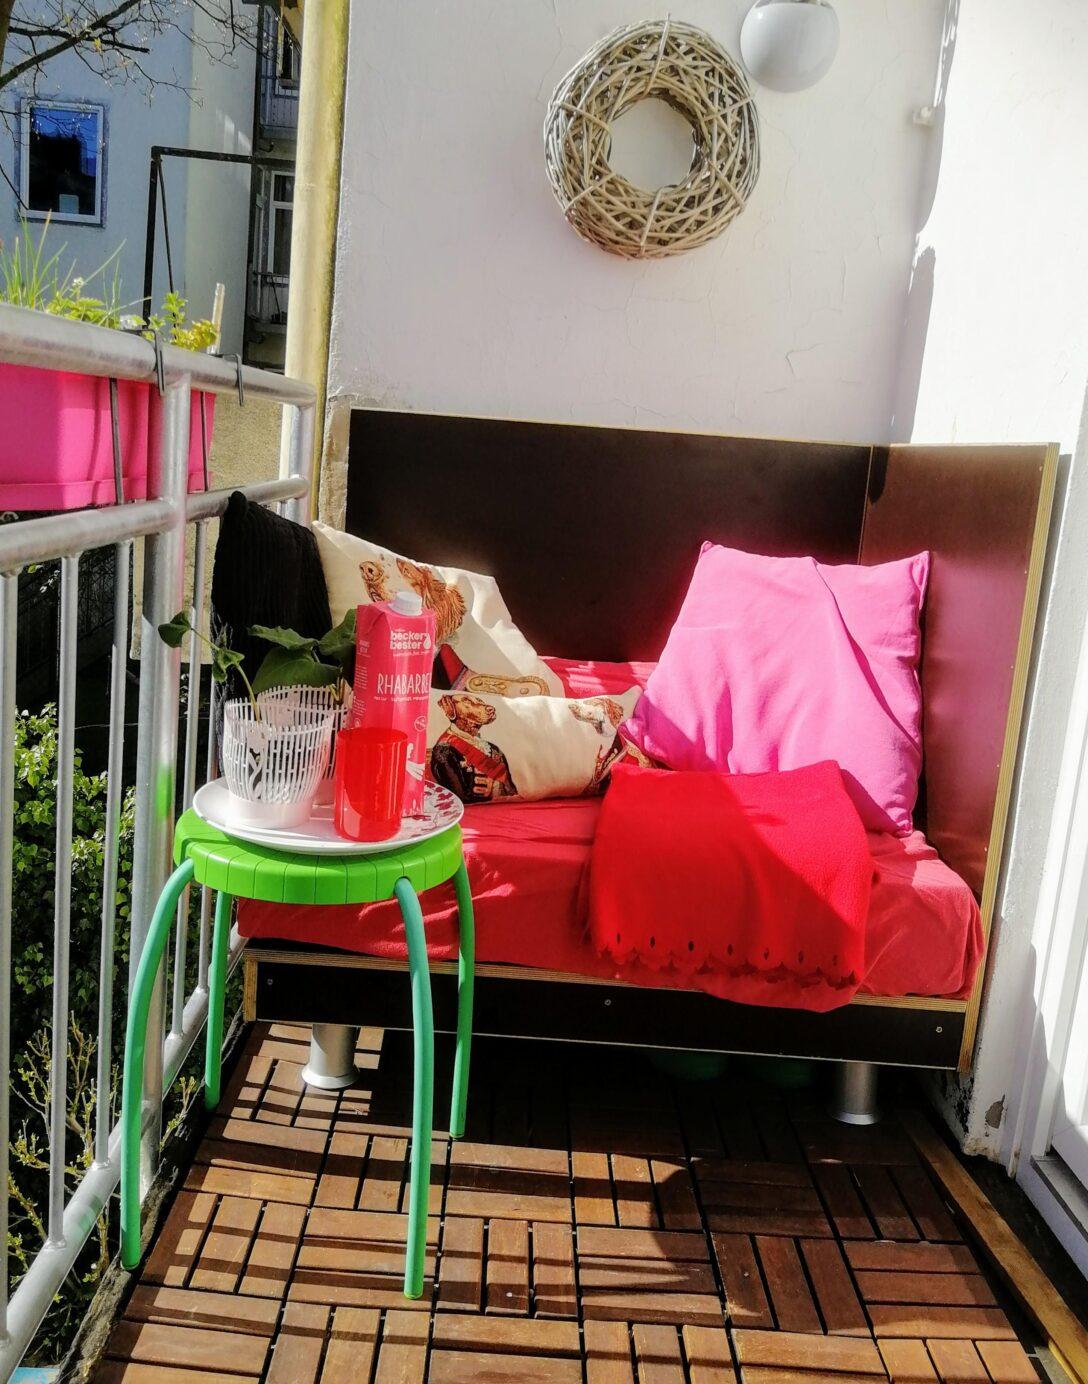 Large Size of Lounge Ecke Wohnzimmer Loungeecke Bilder Ideen Couch Komplett Lampe Loungemöbel Garten Holz Liege Deckenlampe Anbauwand Deckenlampen Deckenleuchten Wohnzimmer Lounge Ecke Wohnzimmer